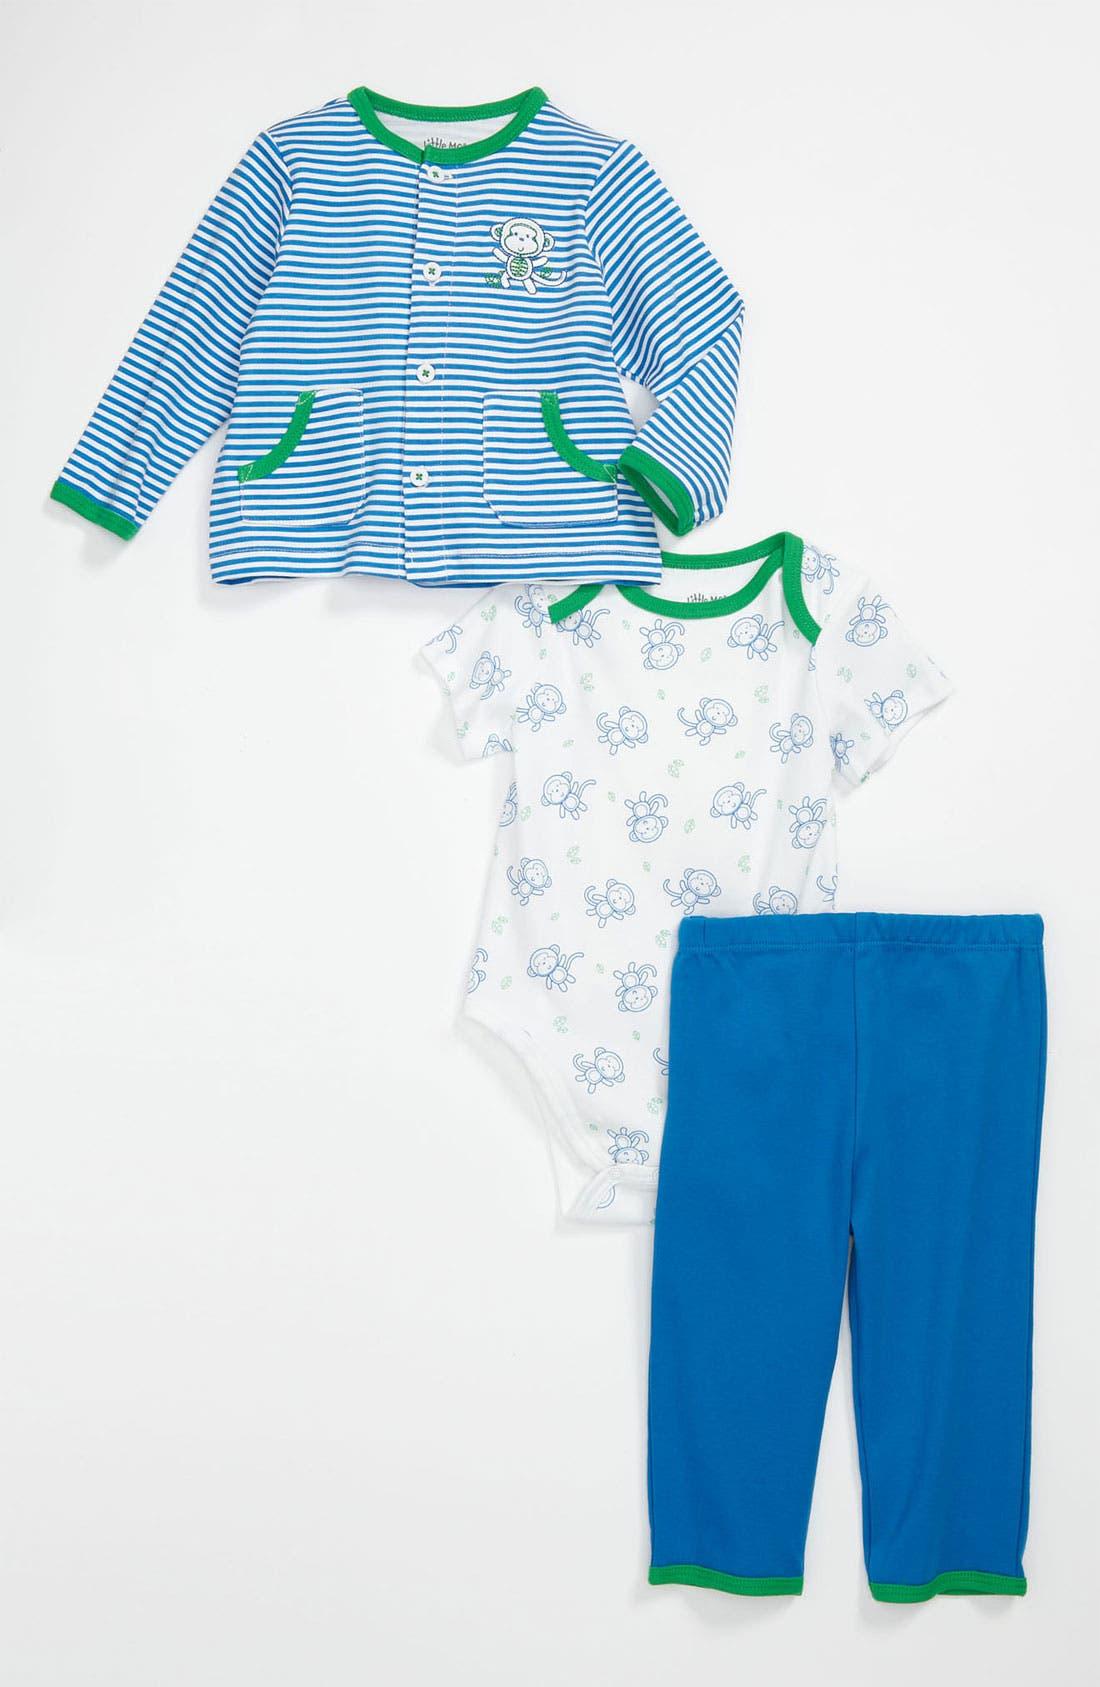 Alternate Image 1 Selected - Little Me 'Take Me Home' Bodysuit, Cardigan & Pants (Infant)